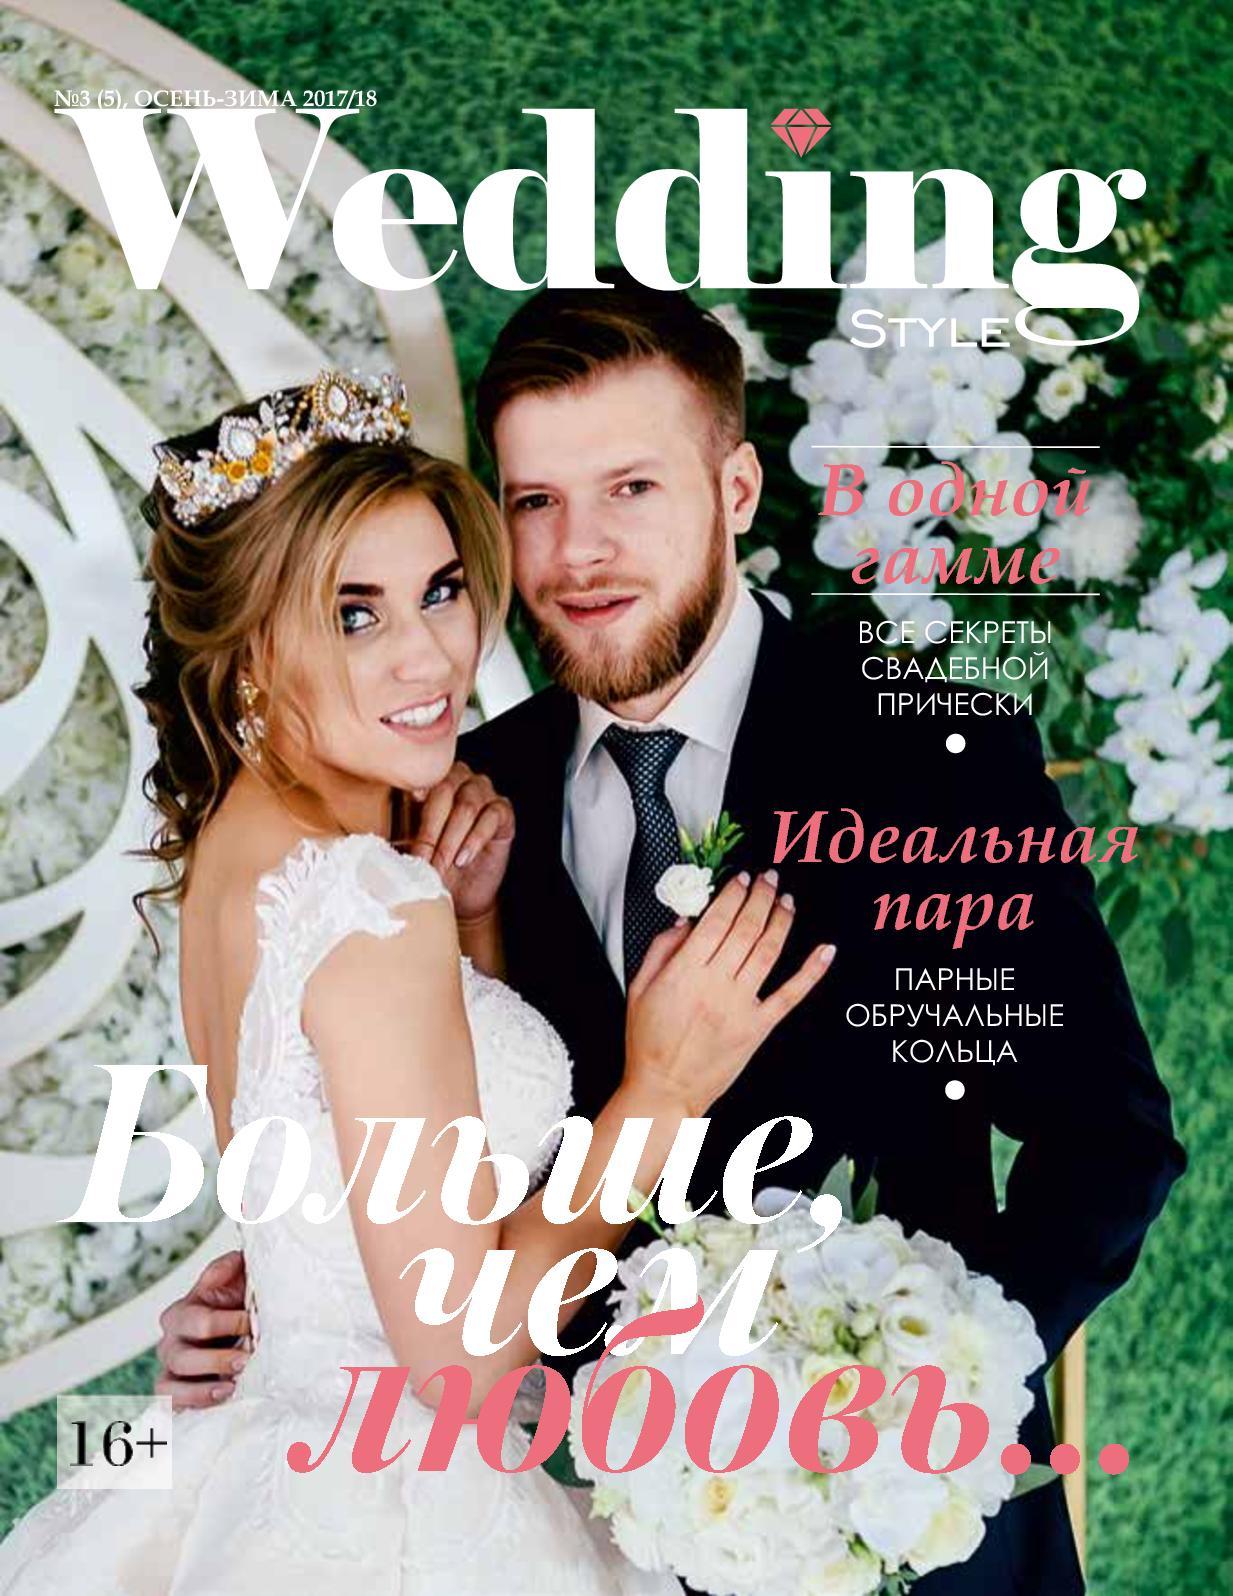 Свадебный журнал Wedding Style, №3(5) ОСЕНЬ/ЗИМА 2017/18г.